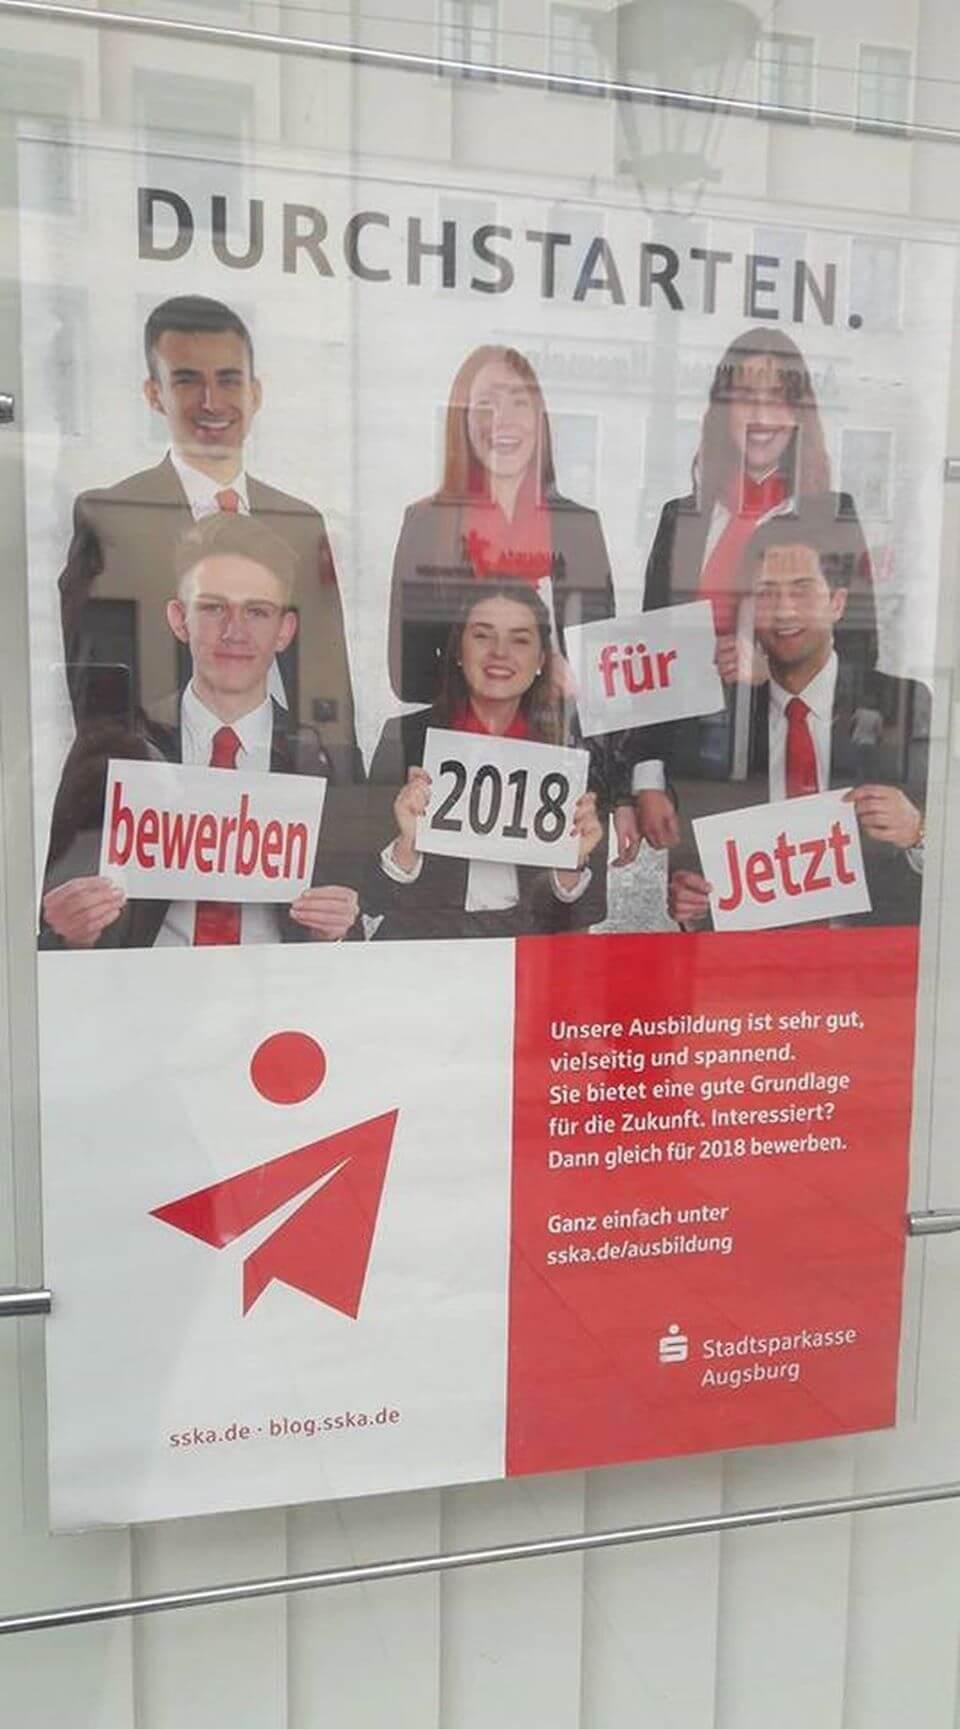 Bilderparade CDLIII LangweileDich.net_Bilderparade_CDLIII_08